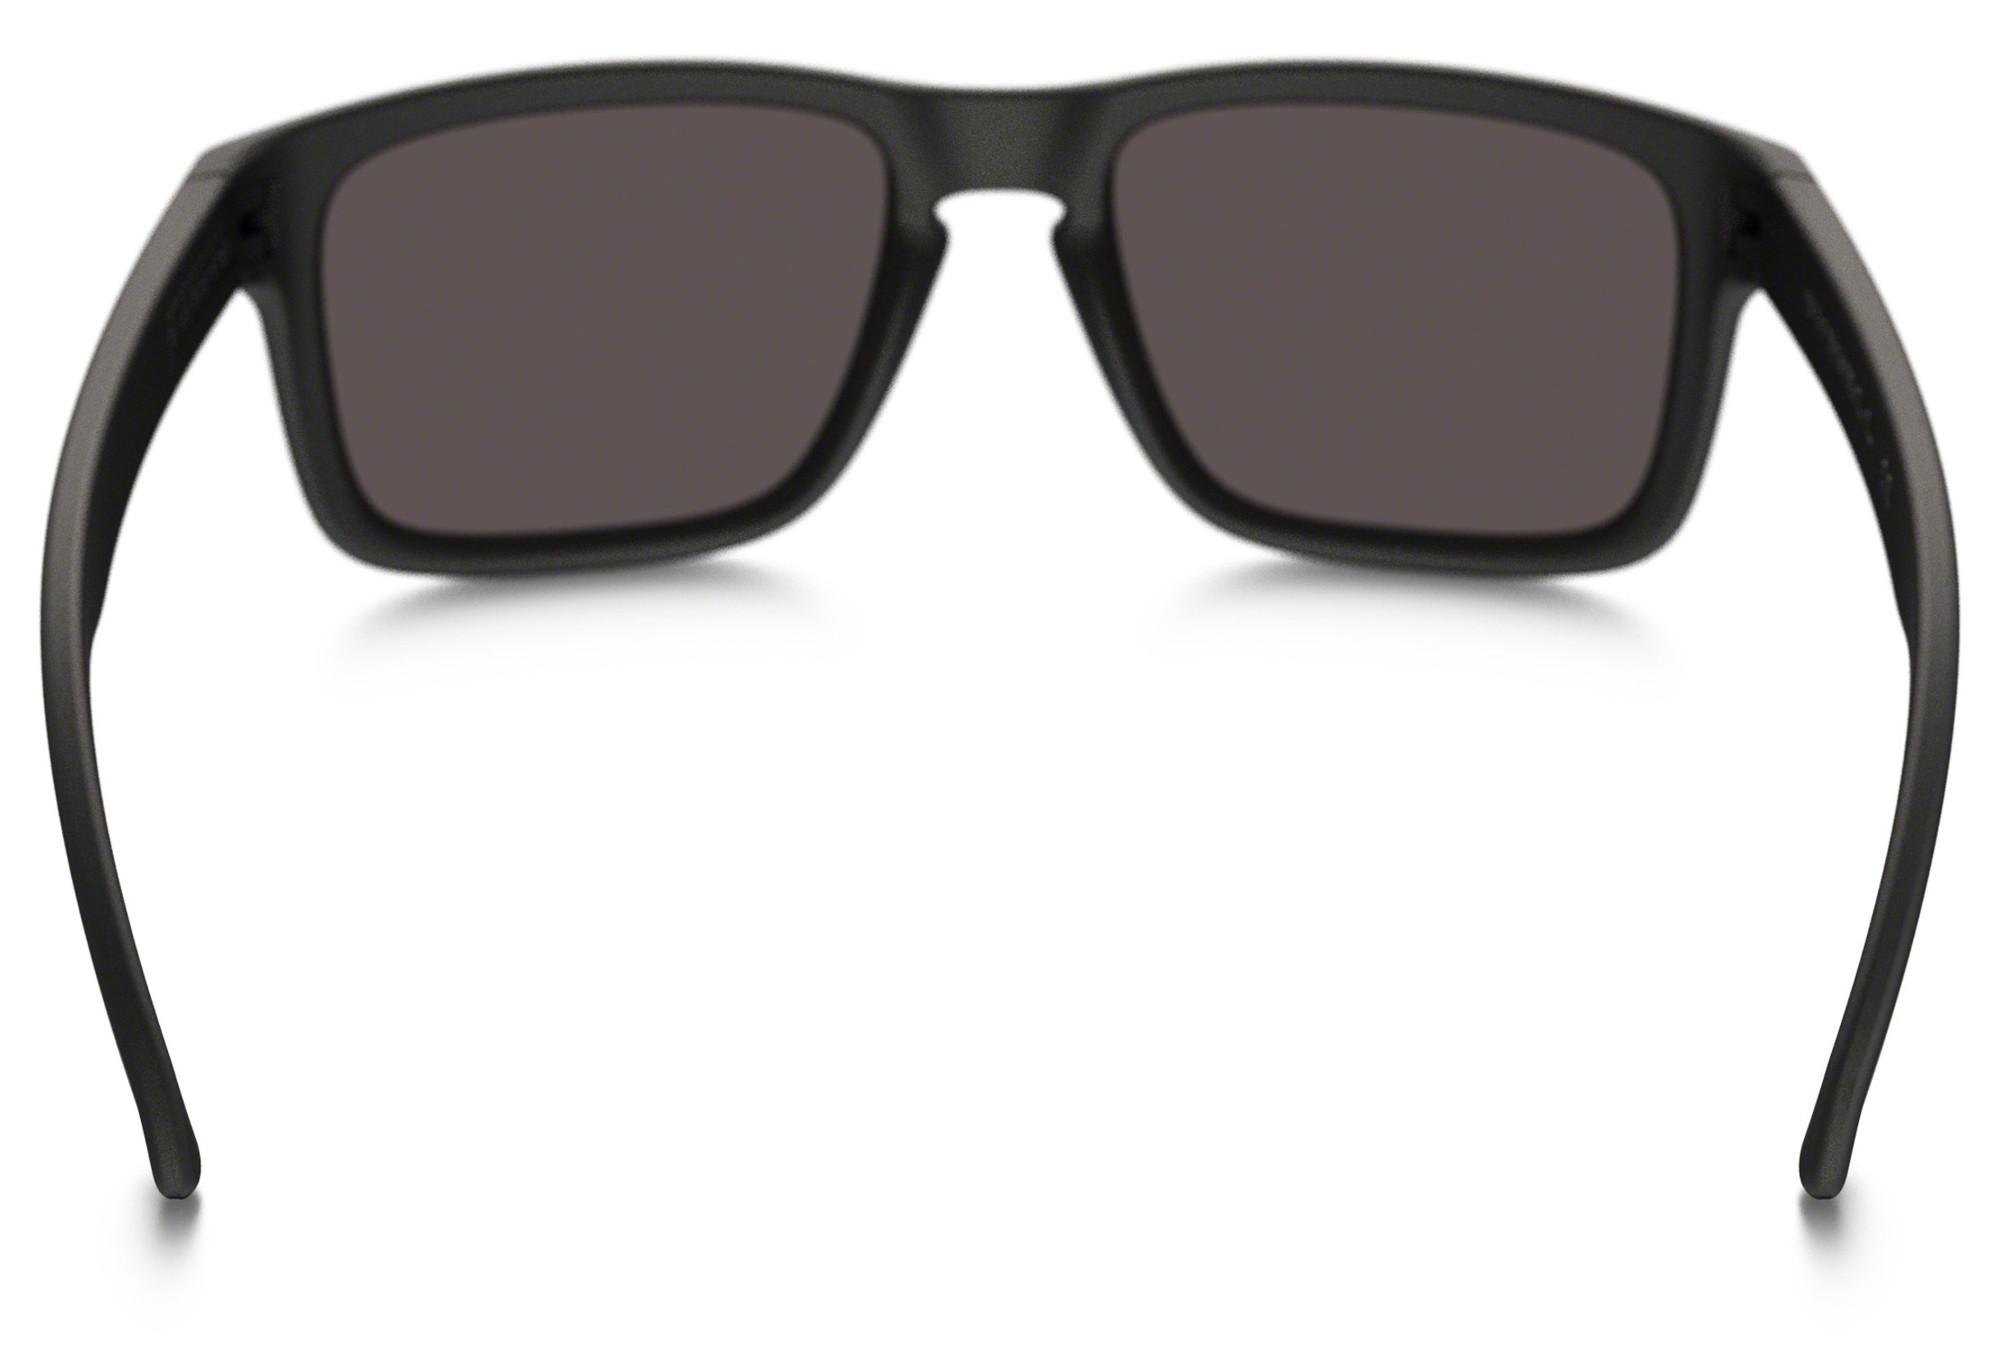 Oakley Holbrook Sunglasses Matte Black   Warm Grey Ref 9102-01 ... ec7098470d